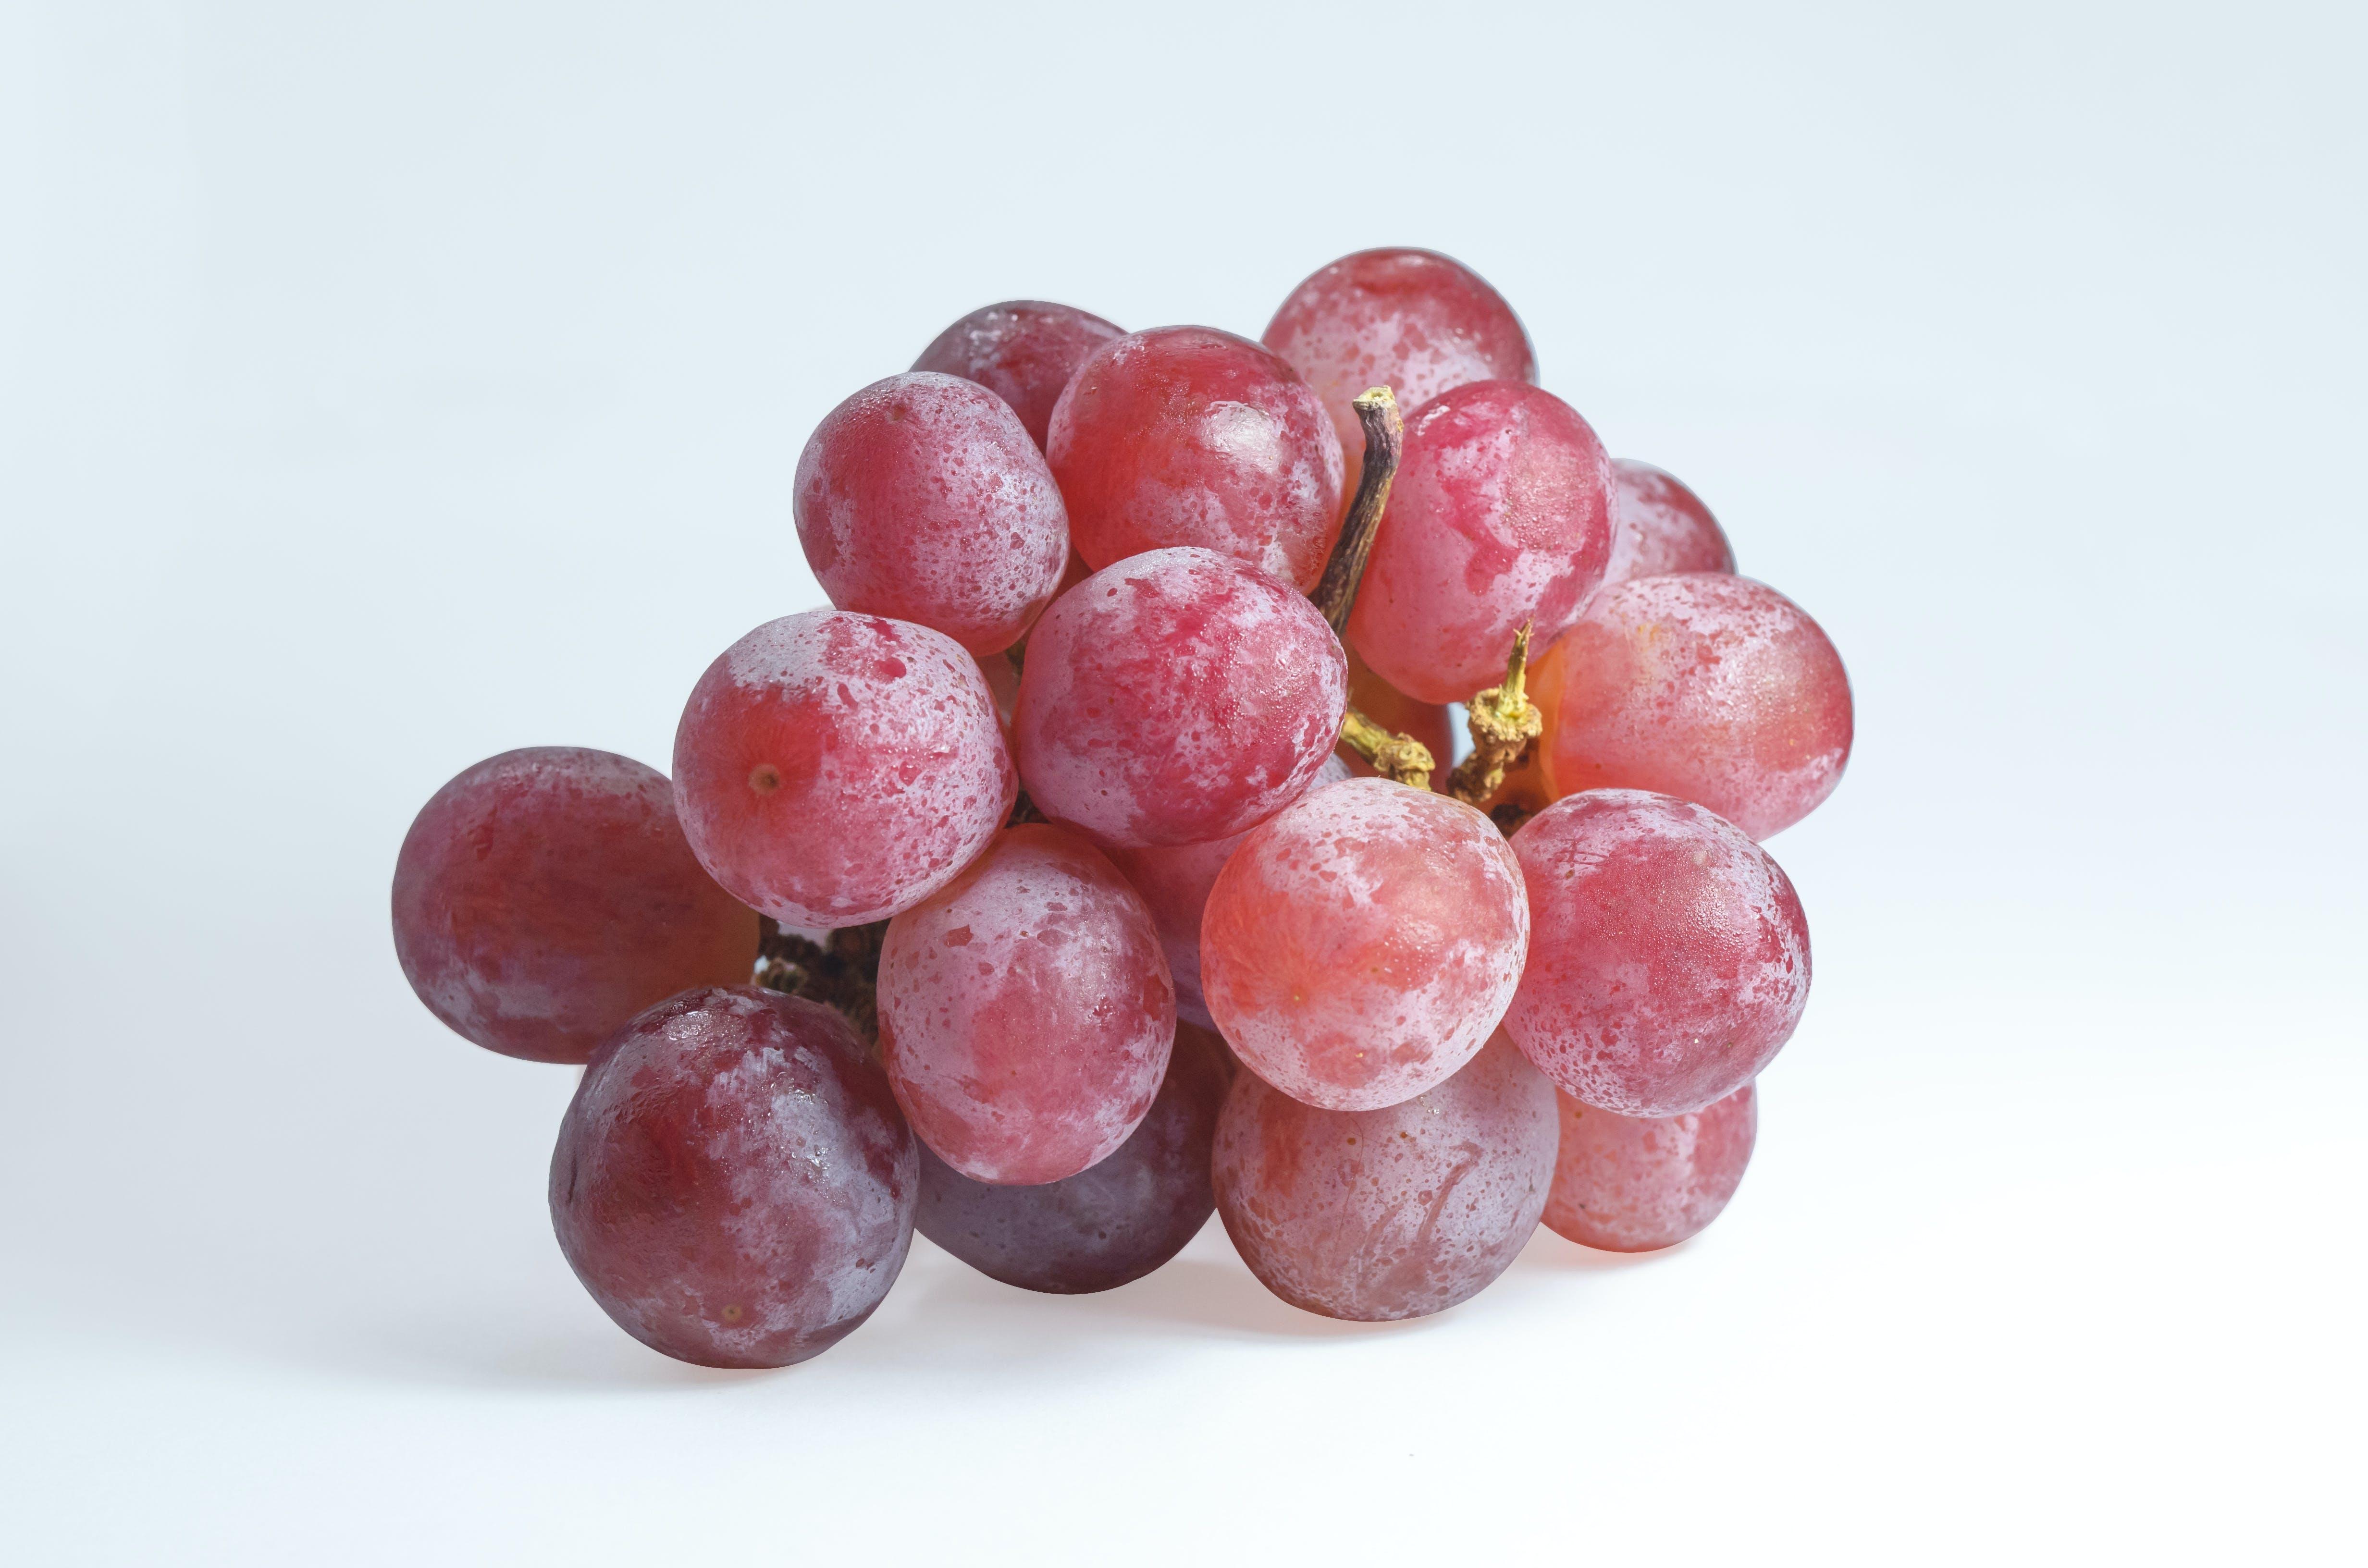 Free stock photo of food, healthy, fruit, tasty